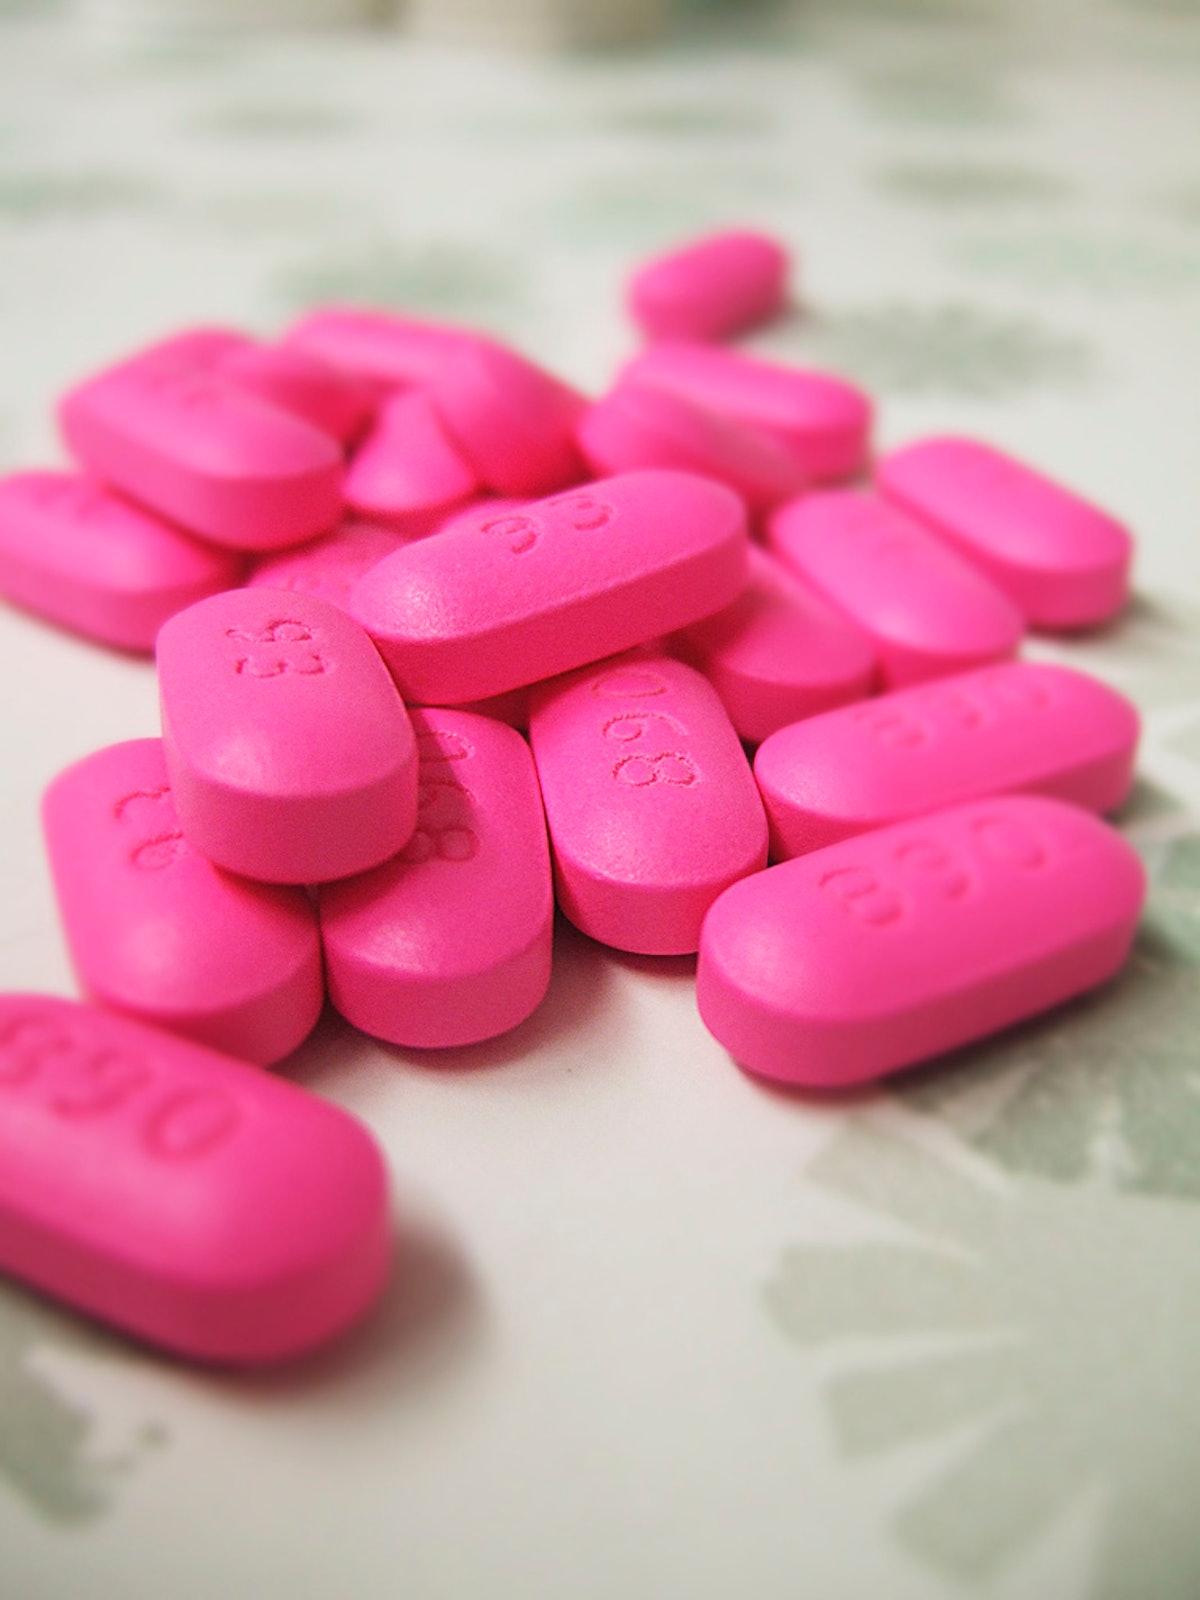 Buy pink viagra